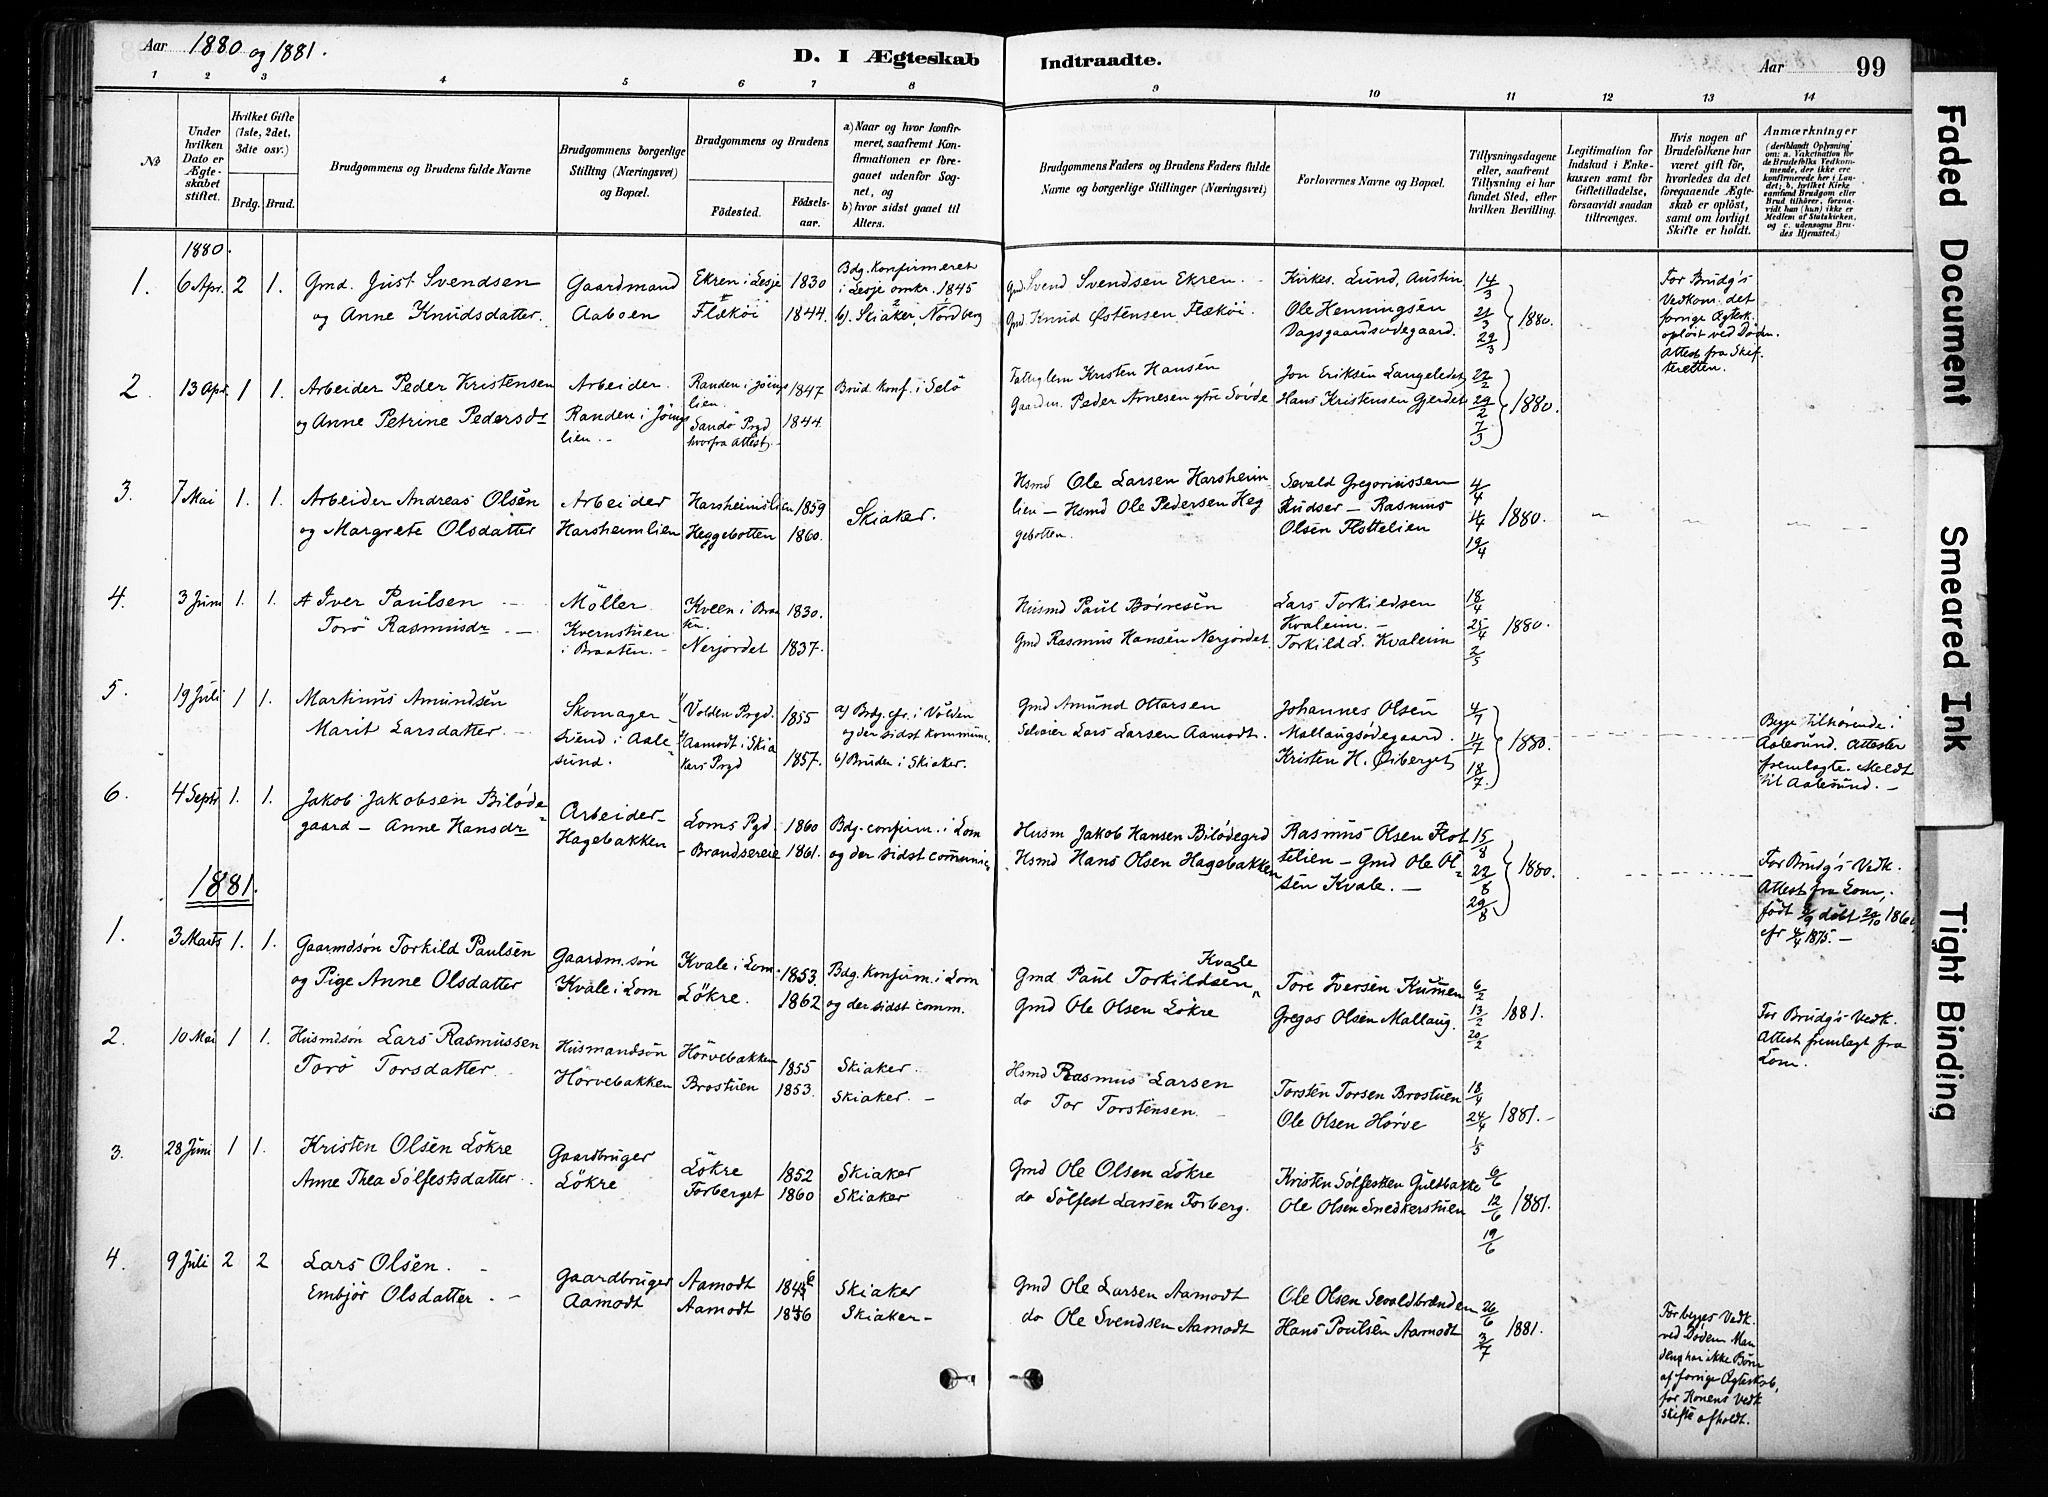 SAH, Skjåk prestekontor, Ministerialbok nr. 4, 1880-1904, s. 99